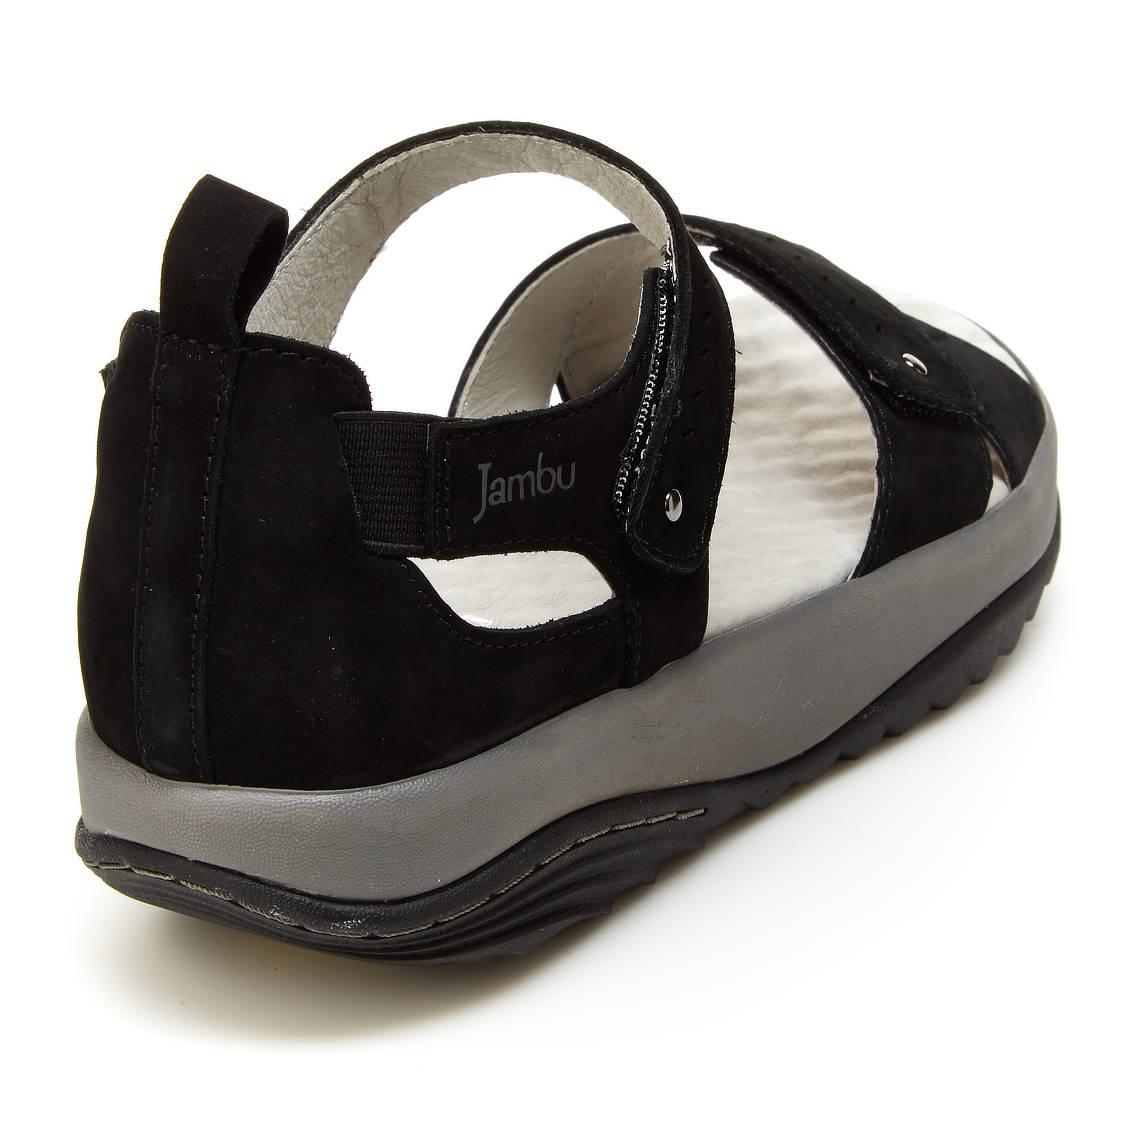 jambu-sedona-j1sed01-black-3